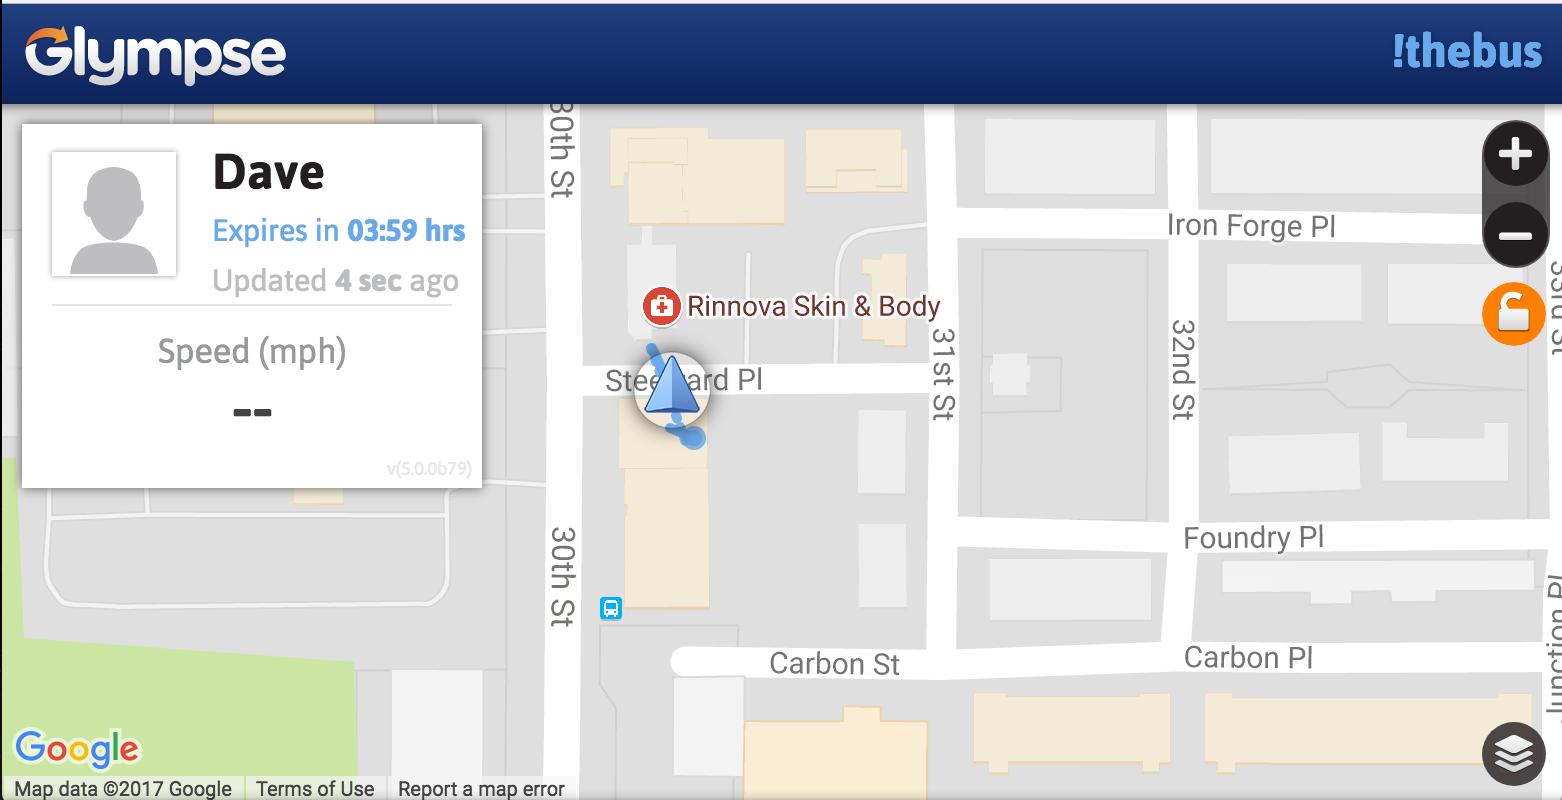 share public tag glympse location address geolocation